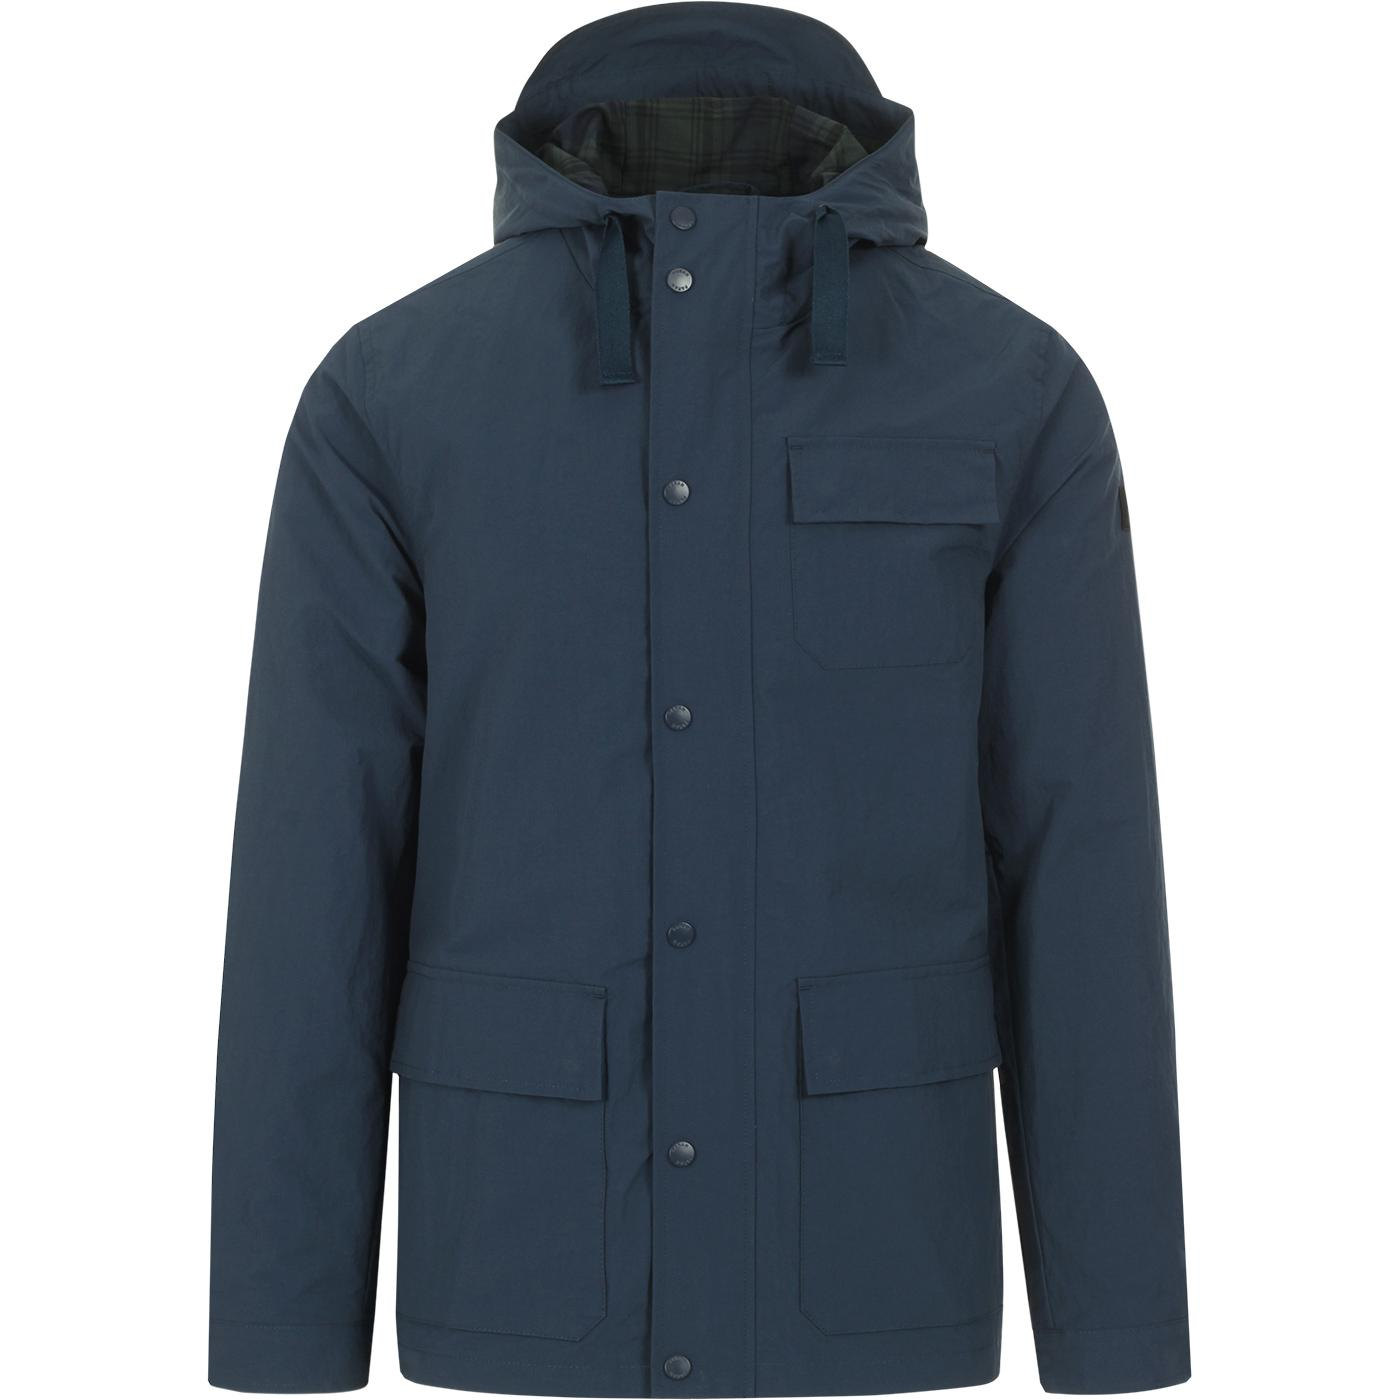 Hanley FARAH 100 Retro 3 Pocket Hooded Coat (Teal)